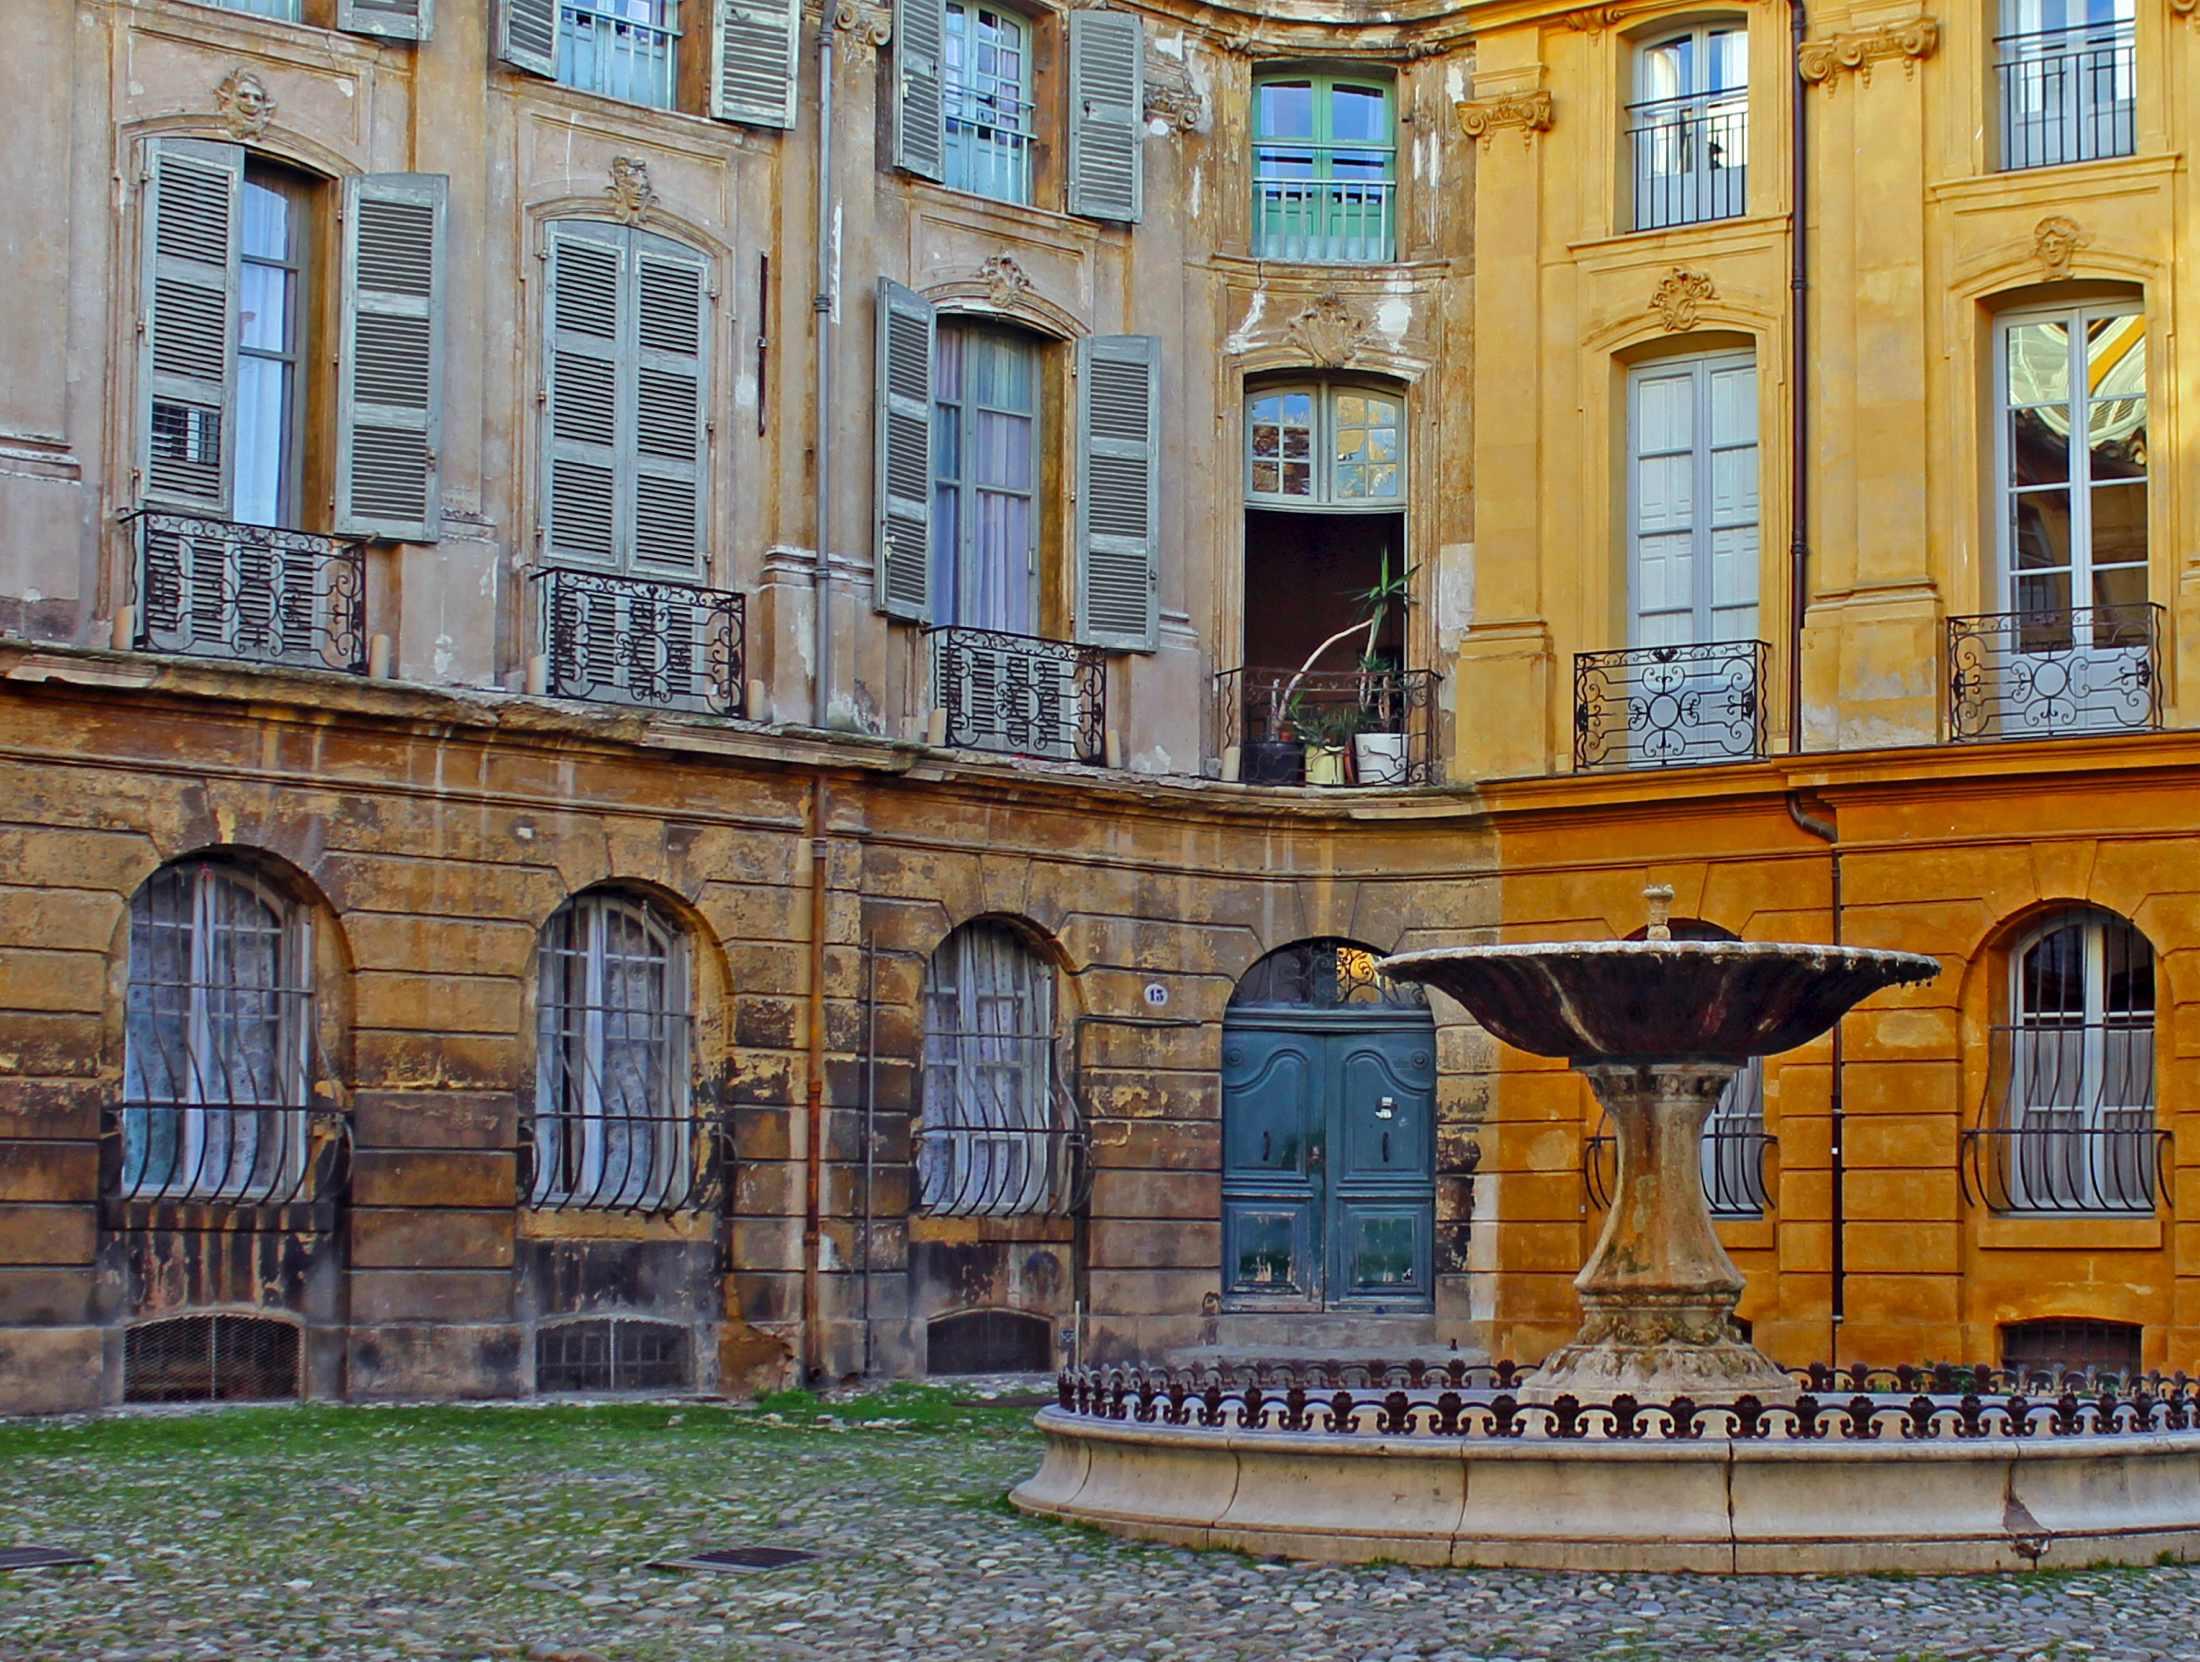 Aix-en-Provence - Focal Journey